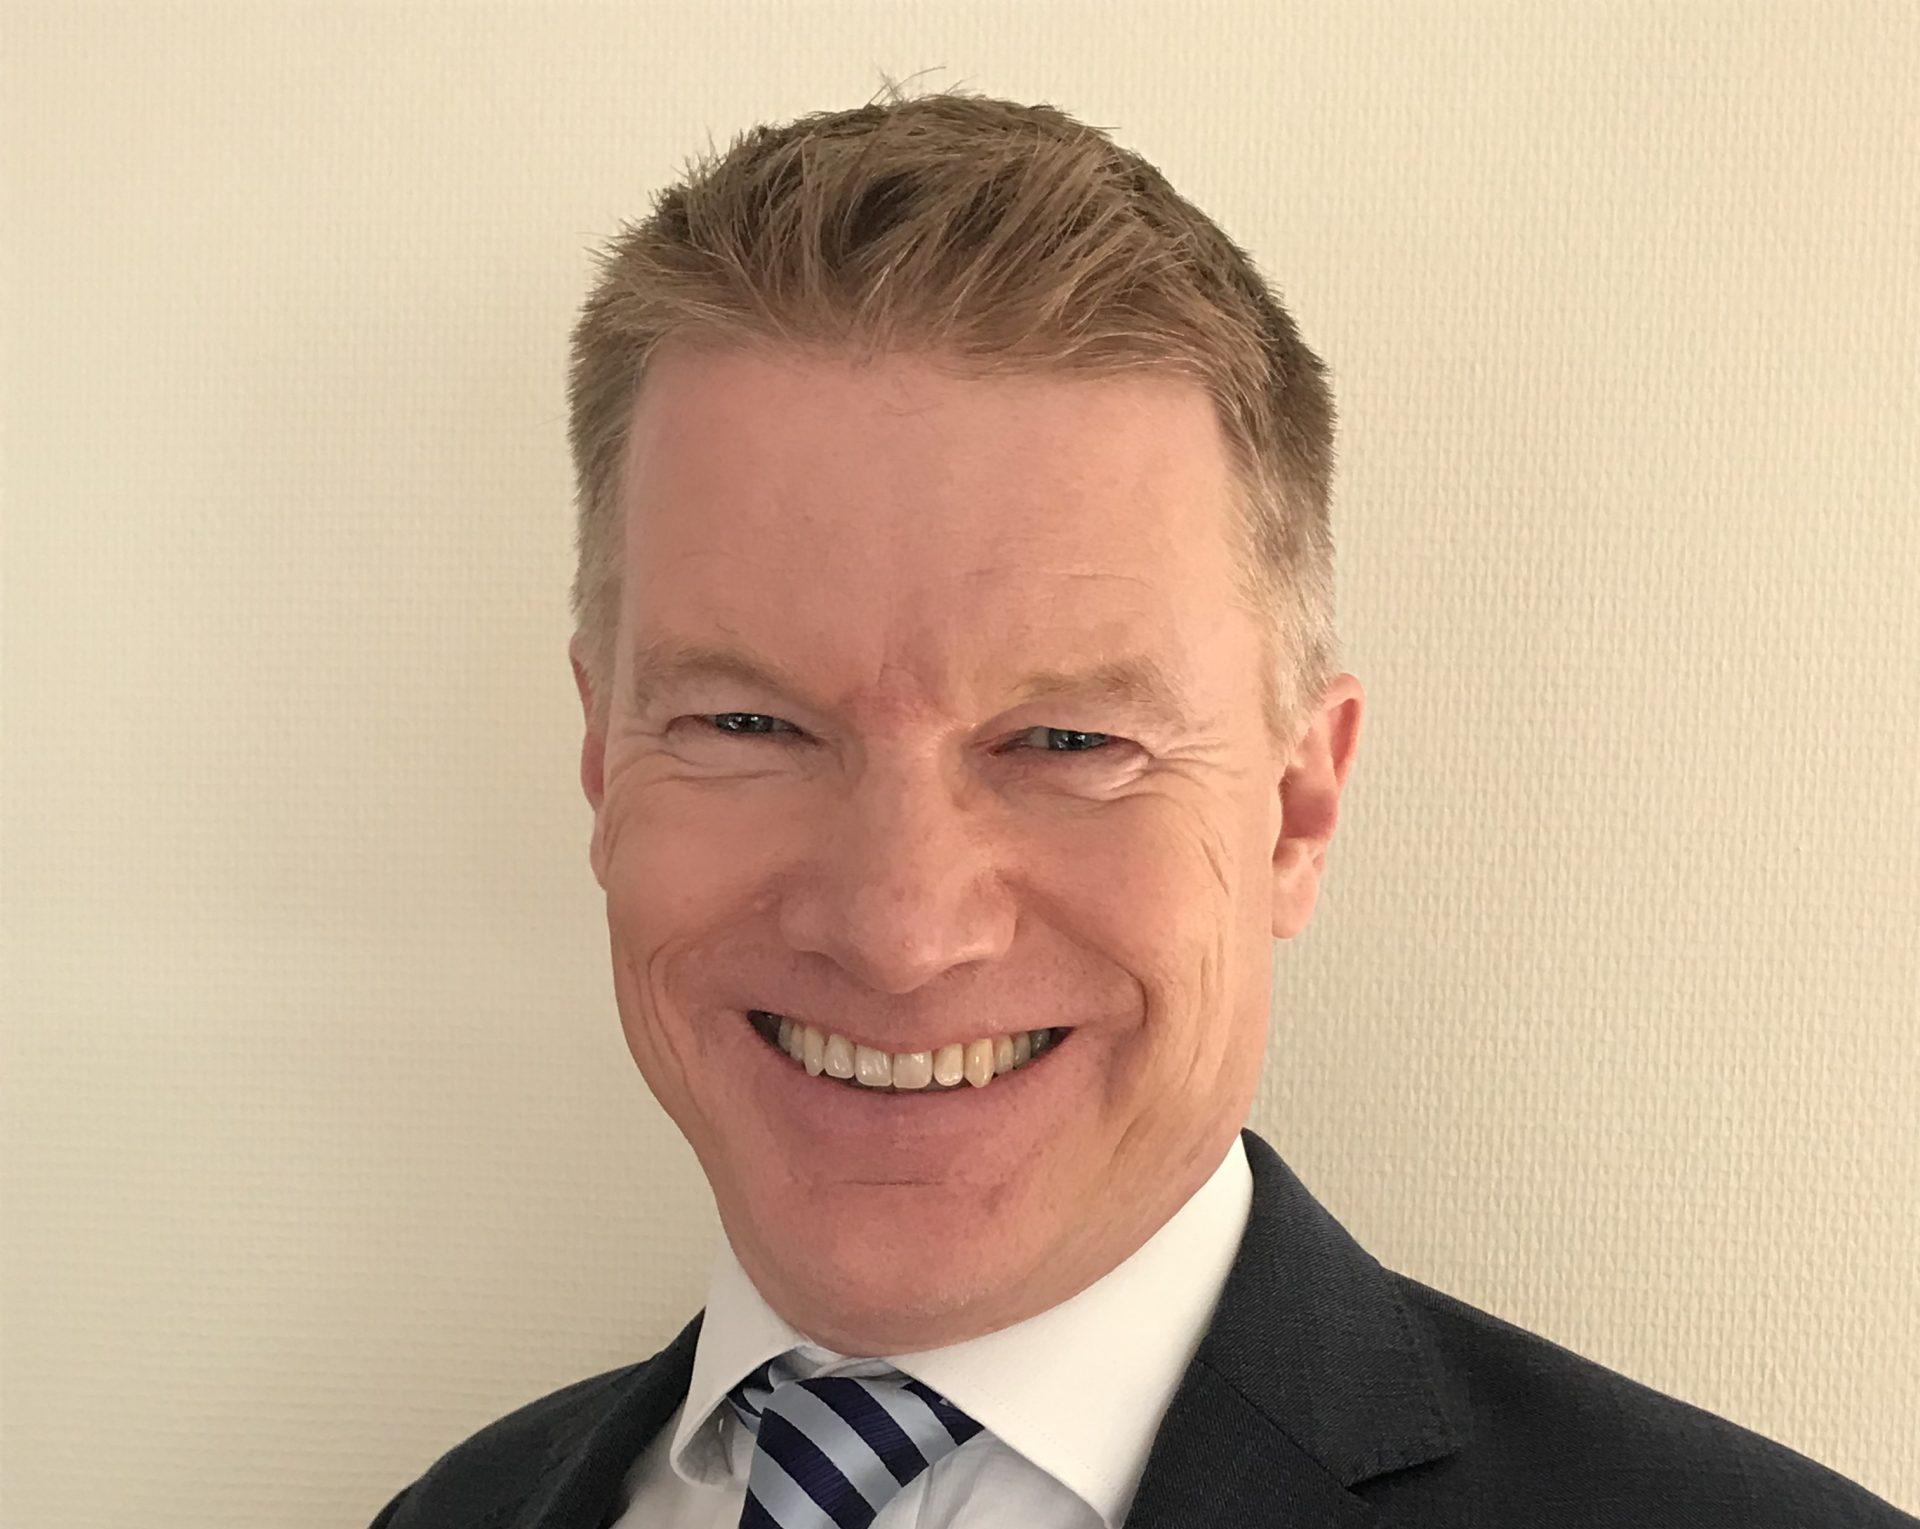 Richard Stone forlader jobbet hos Scandic Hotels som salgsdirektør for internationalt leisuresalg til fordel for det danske rederi DFDS, hvor han skal være Head of Field Sales. Foto via DFDS.